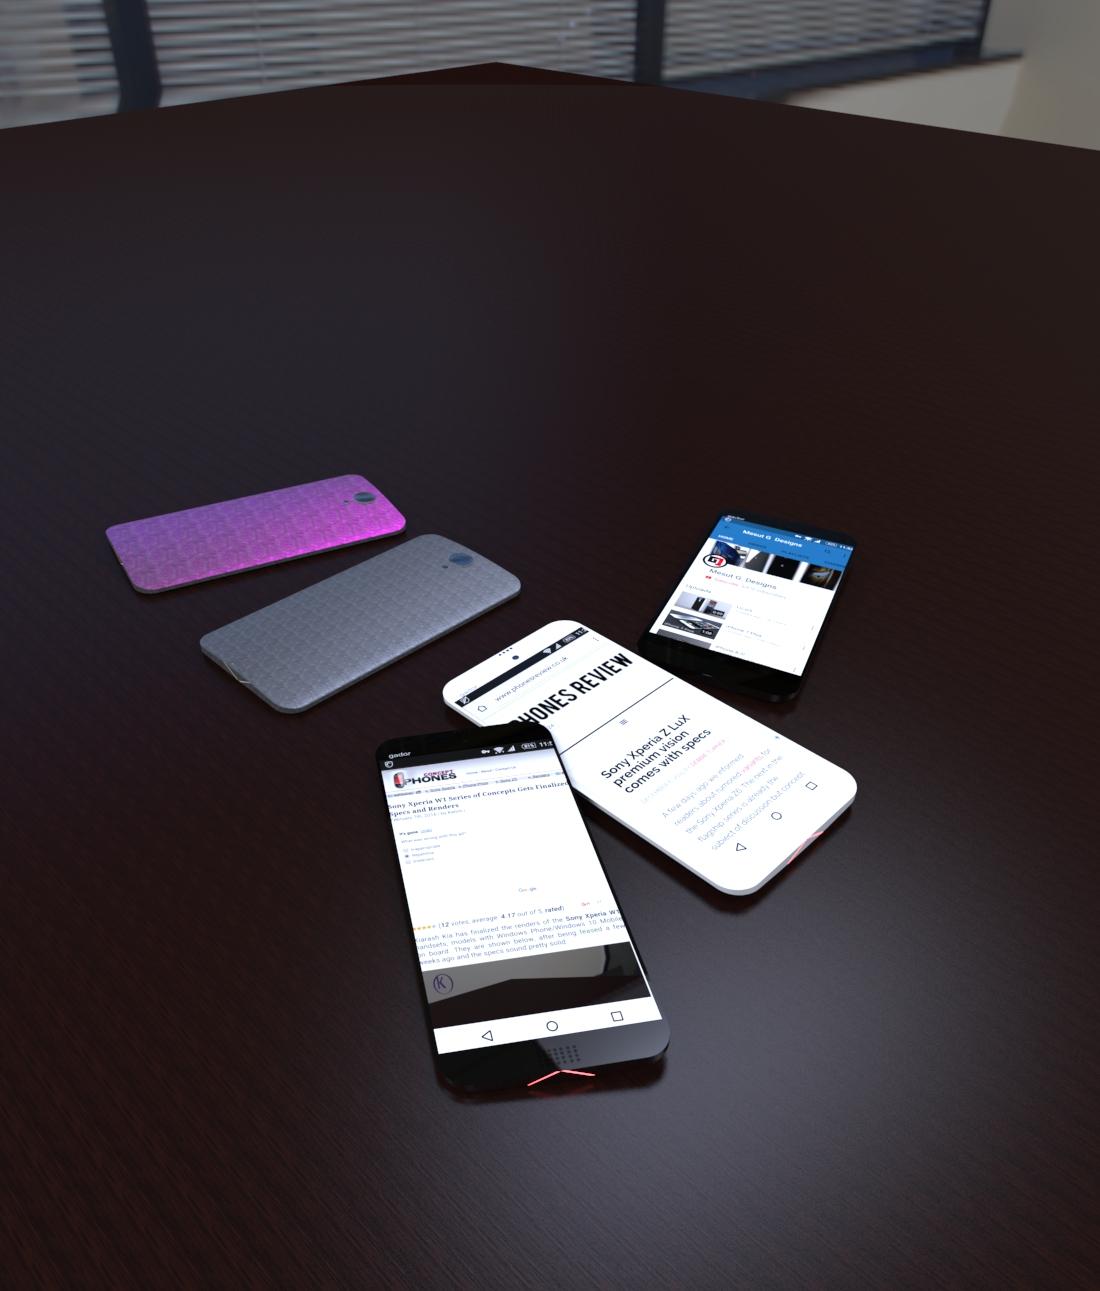 Gador-X-concept-phone-9